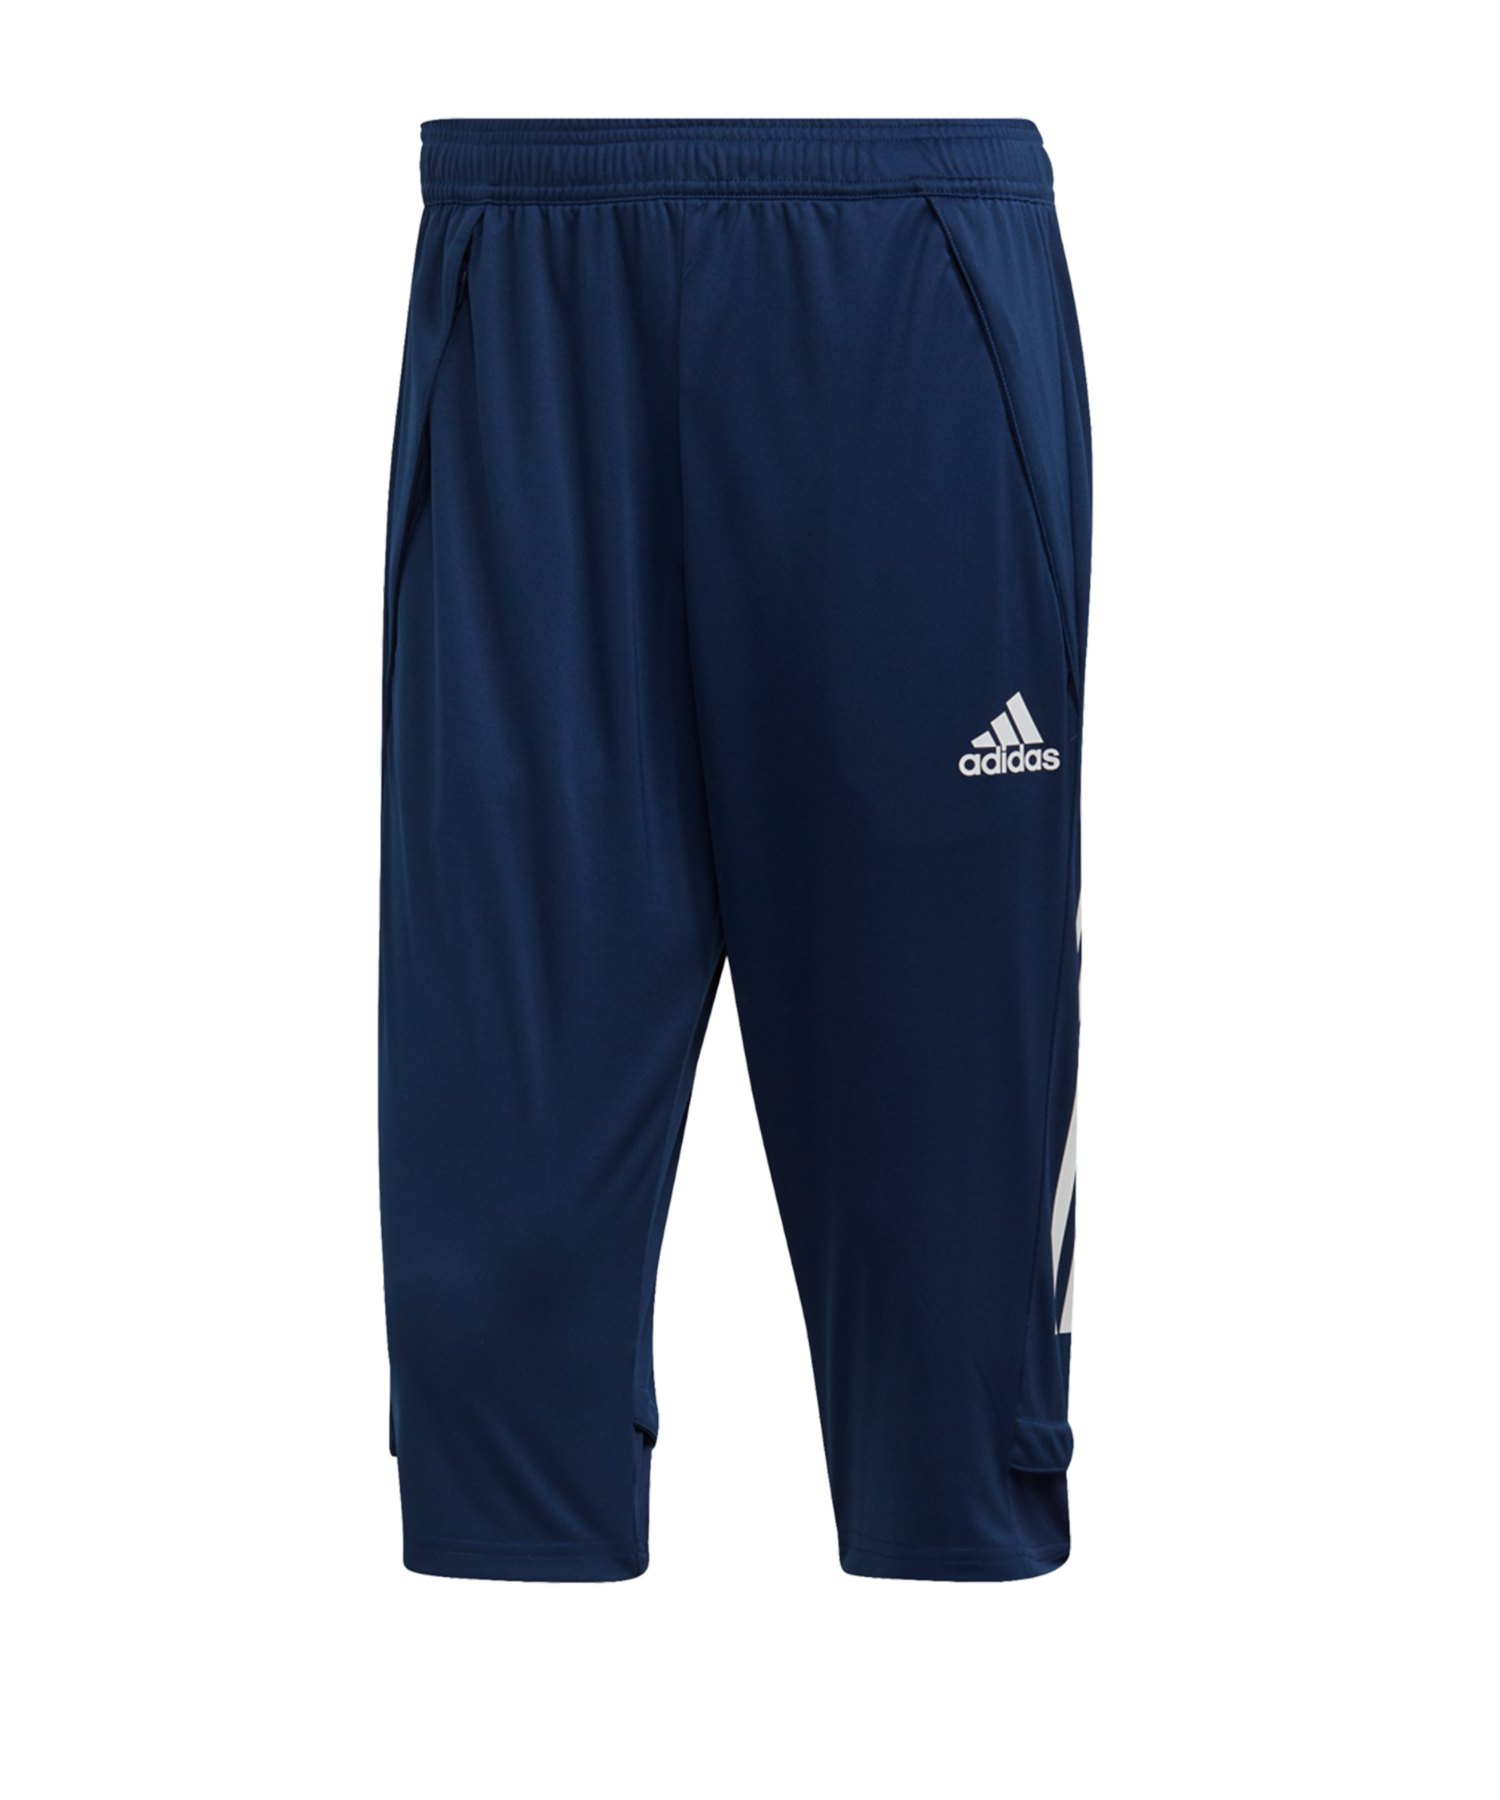 adidas Condivo 20 3/4 Hose Blau Weiss - blau